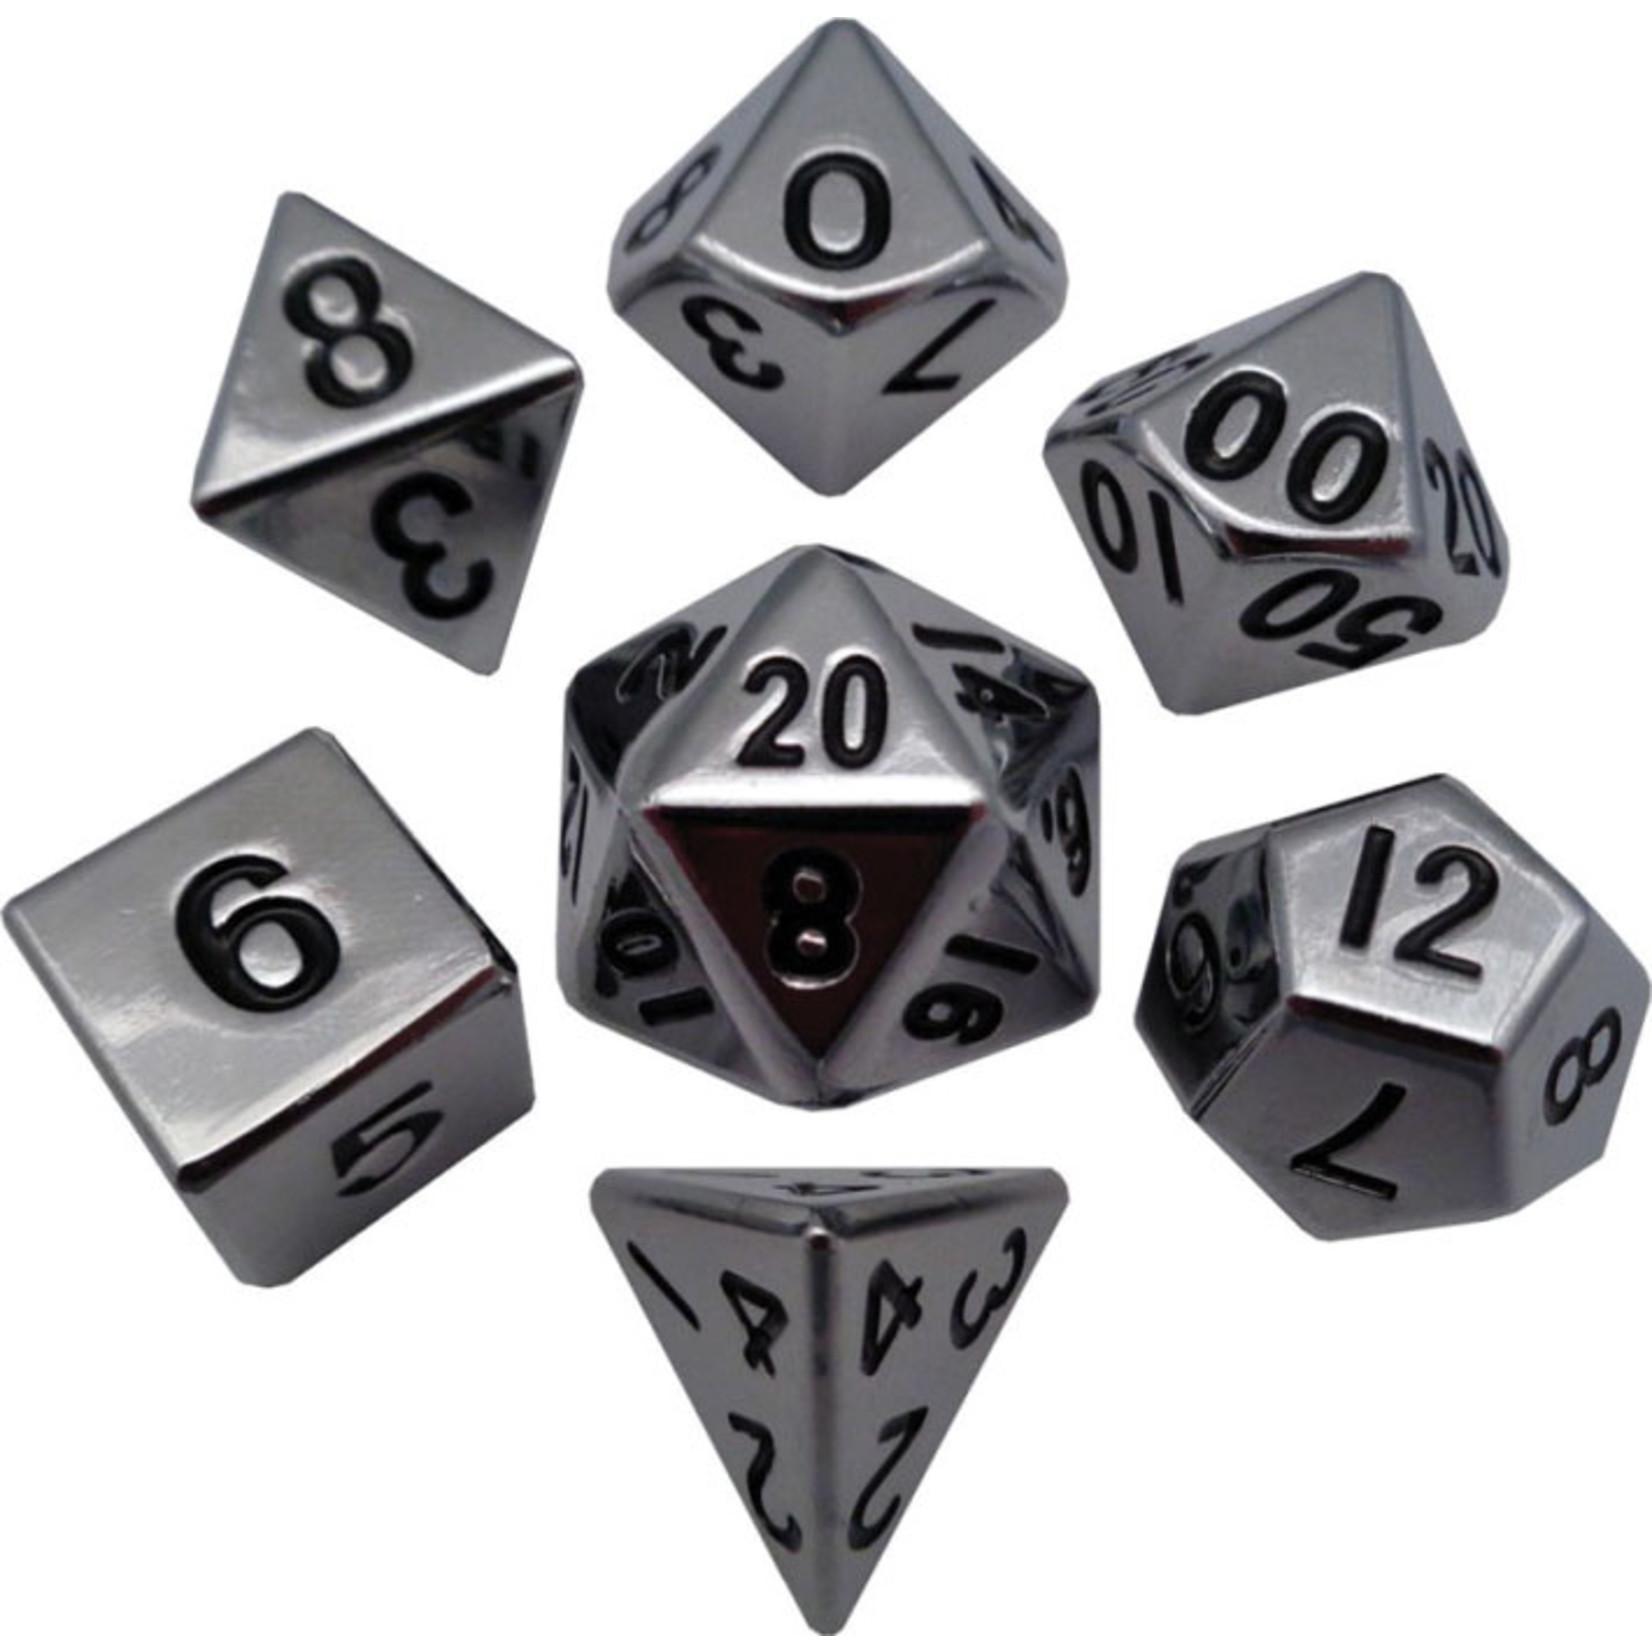 16mm Silver Polyhedral Metal Dice Set